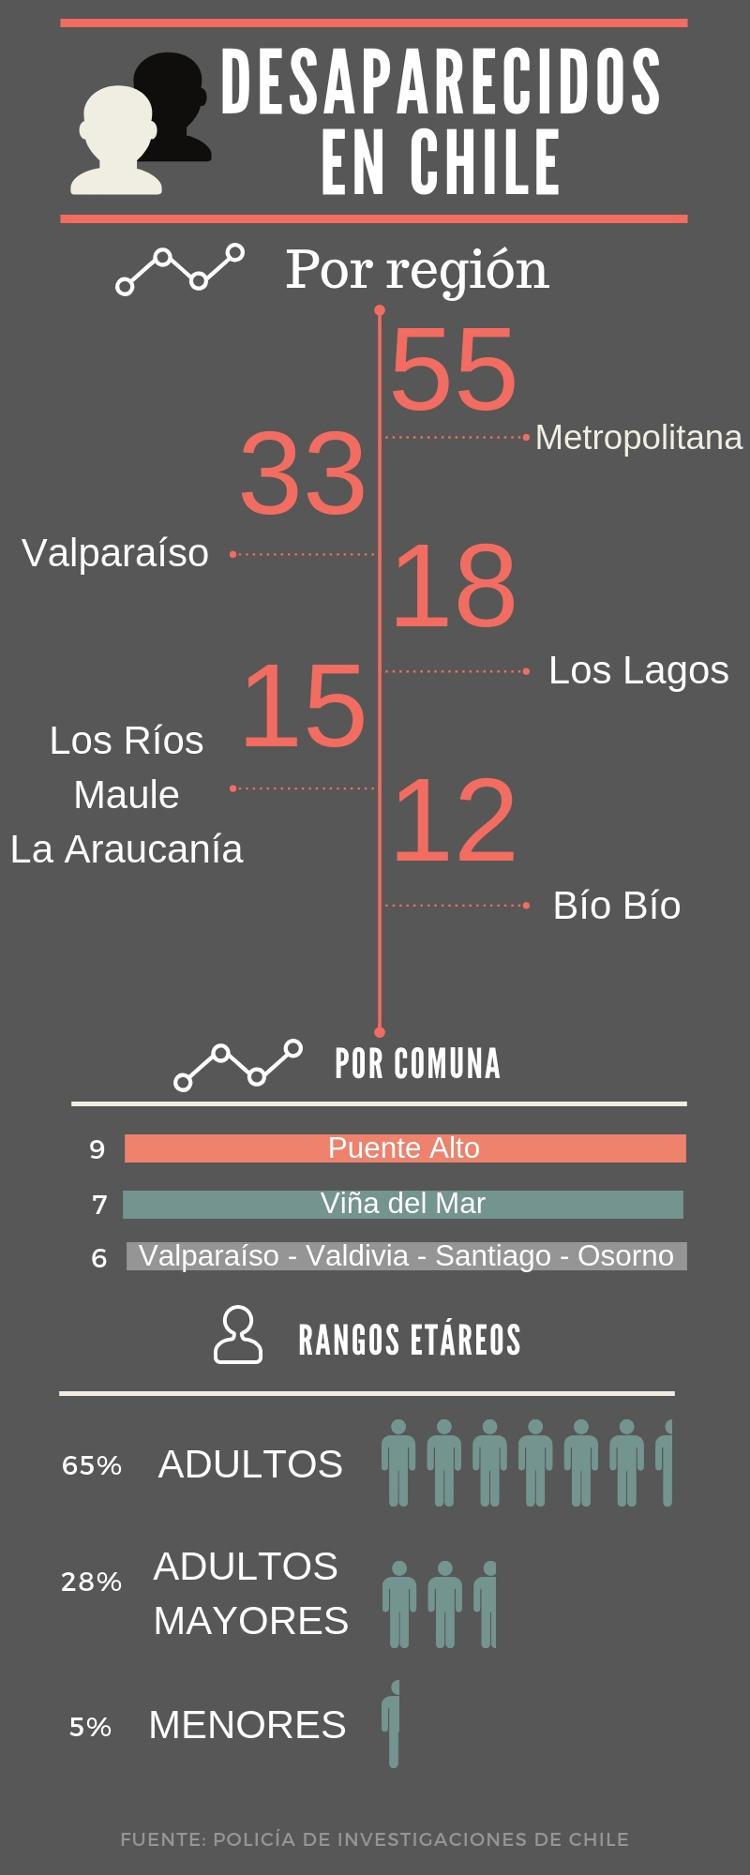 Desaparecidos en Chile | Infografía: Alberto González | www.canva.com